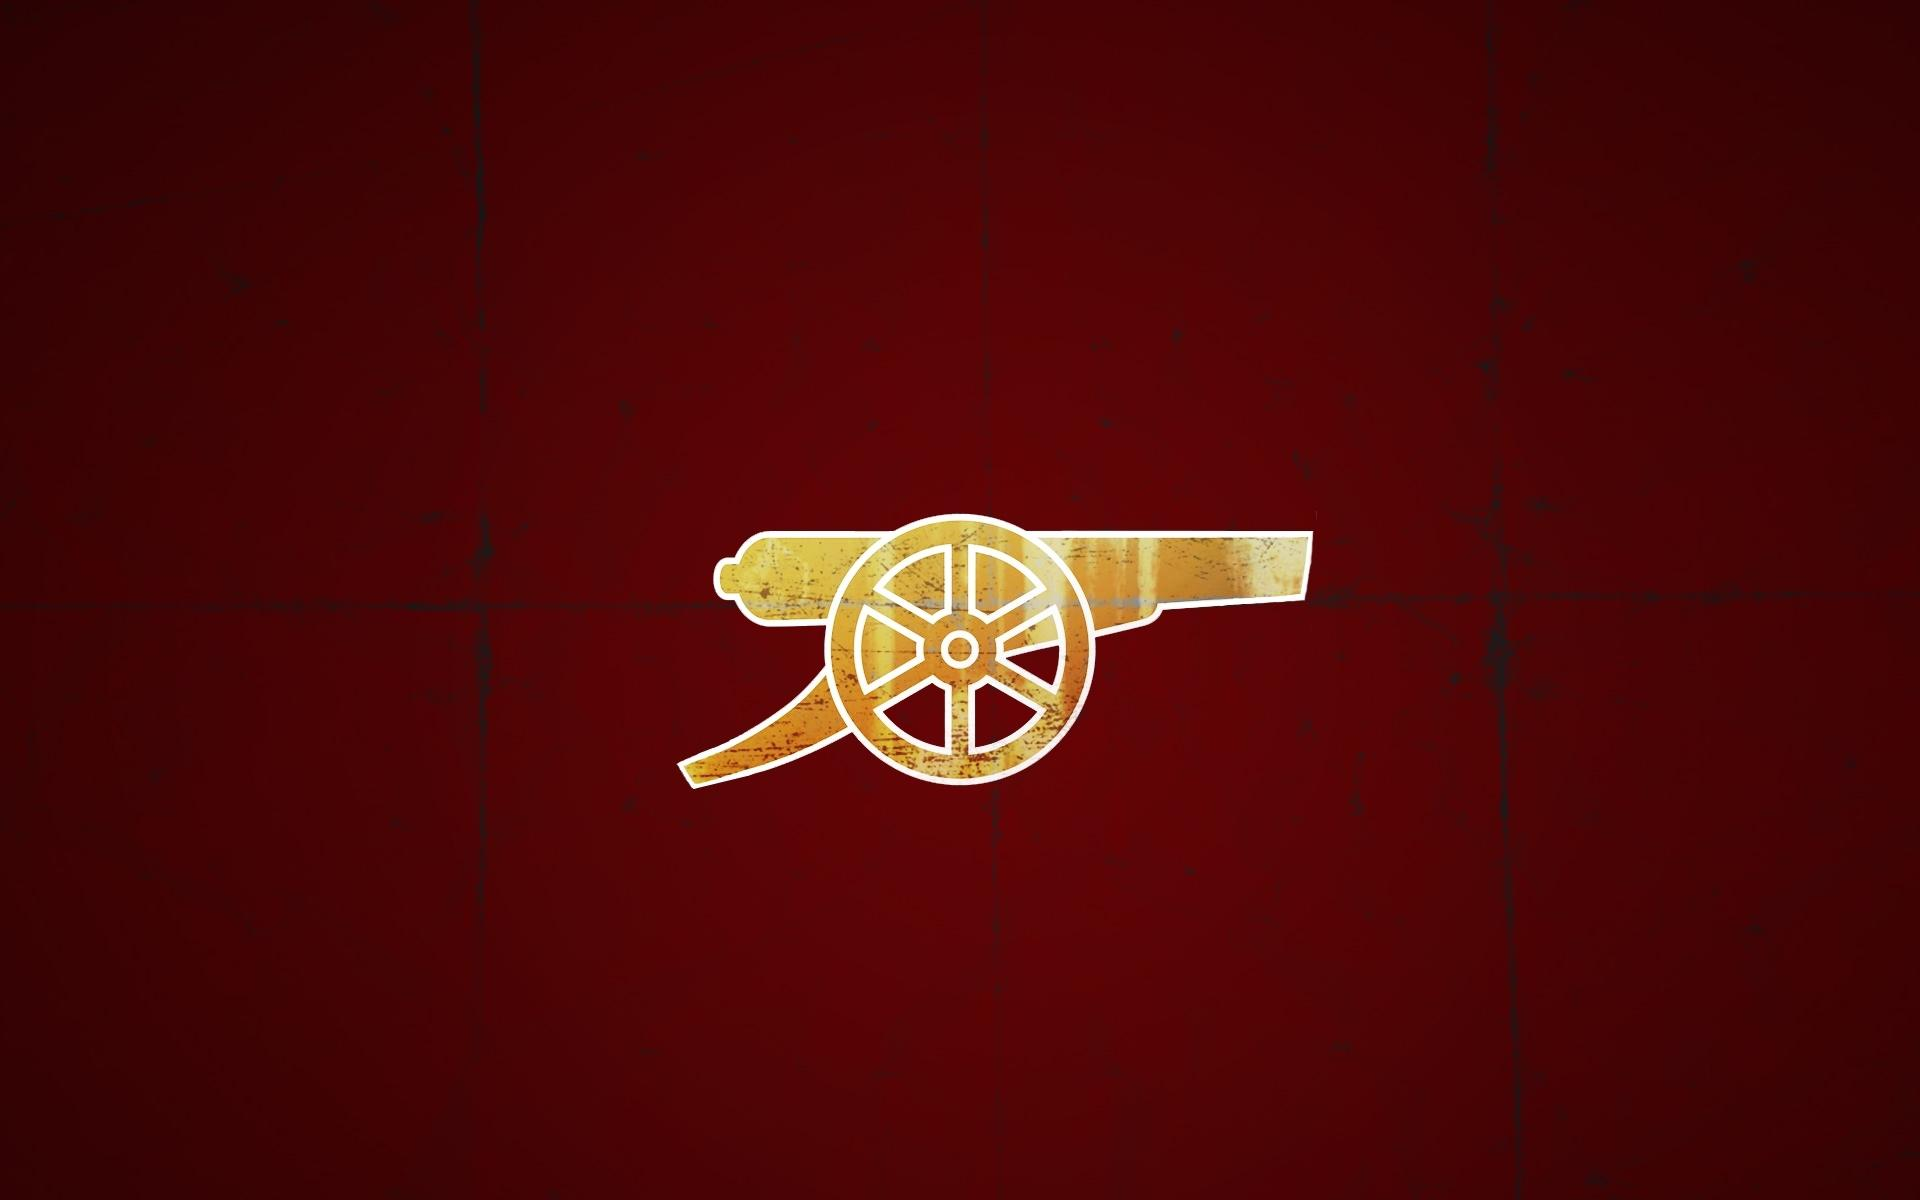 arsenal football club logo wallpaper